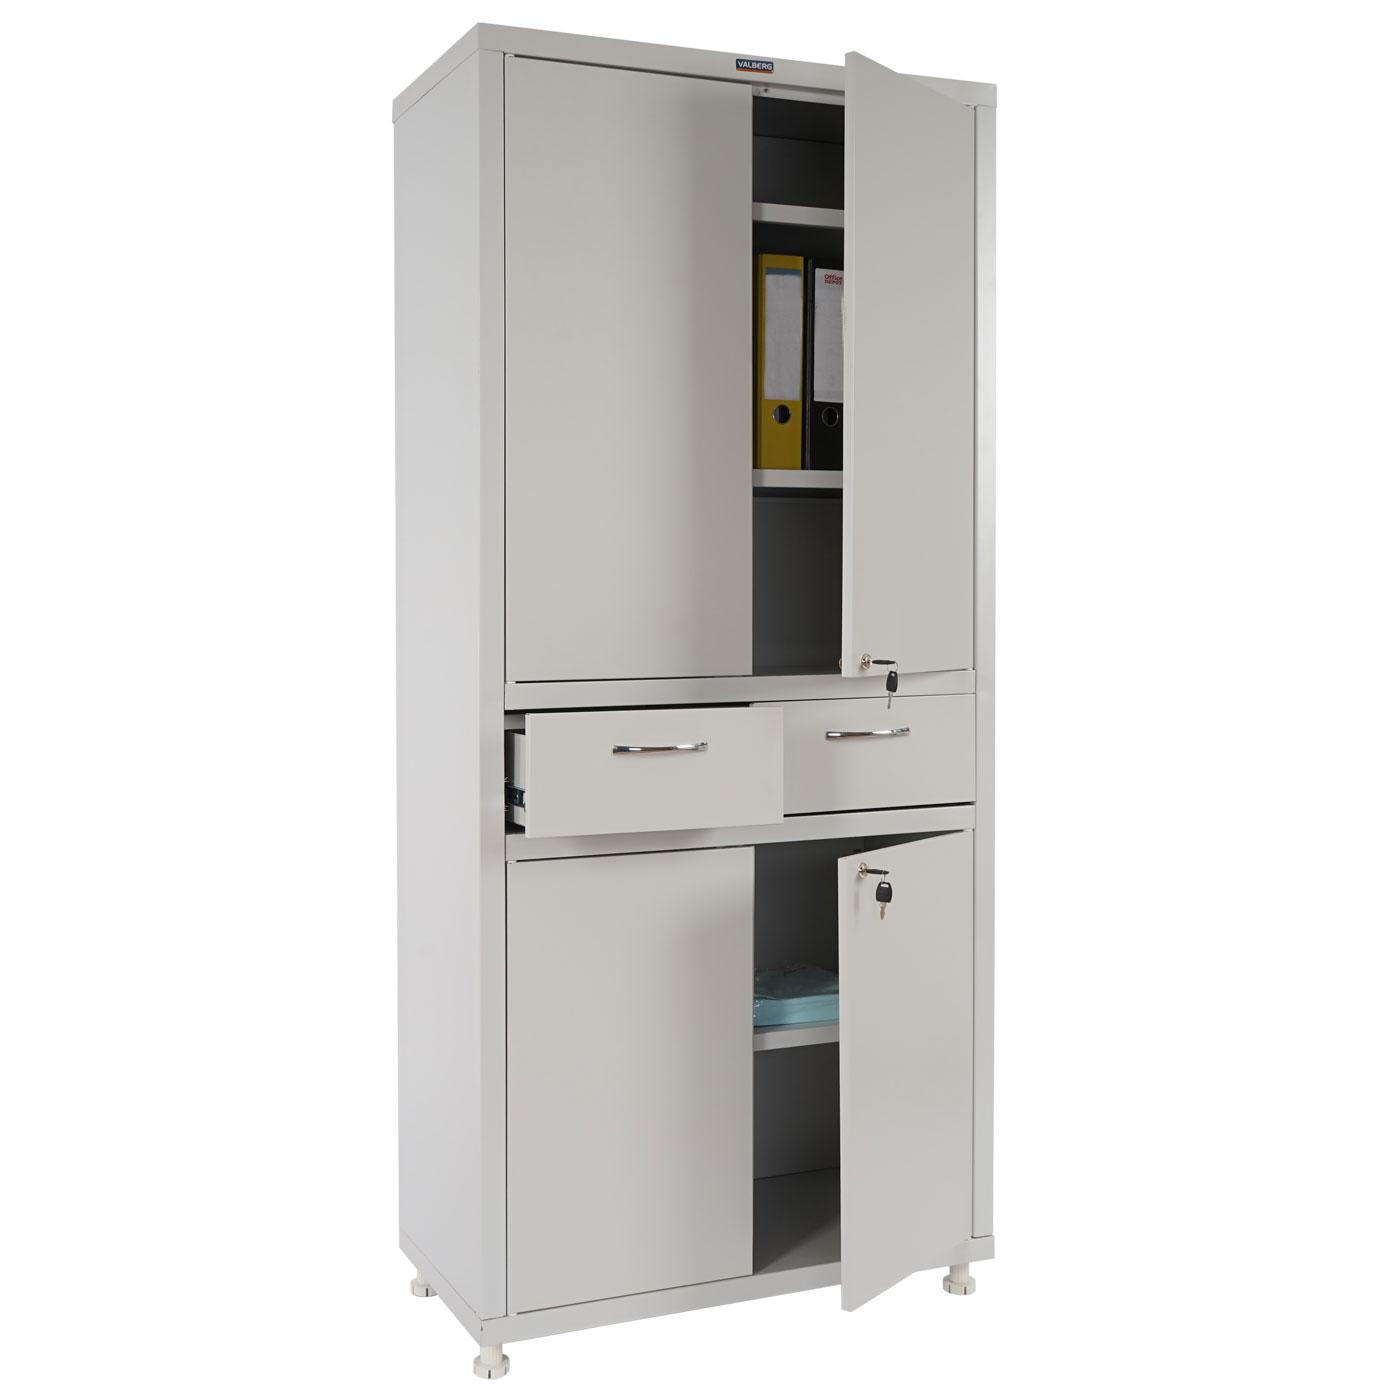 metallschrank valberg t380 aktenschrank b ro 4 t ren 2. Black Bedroom Furniture Sets. Home Design Ideas